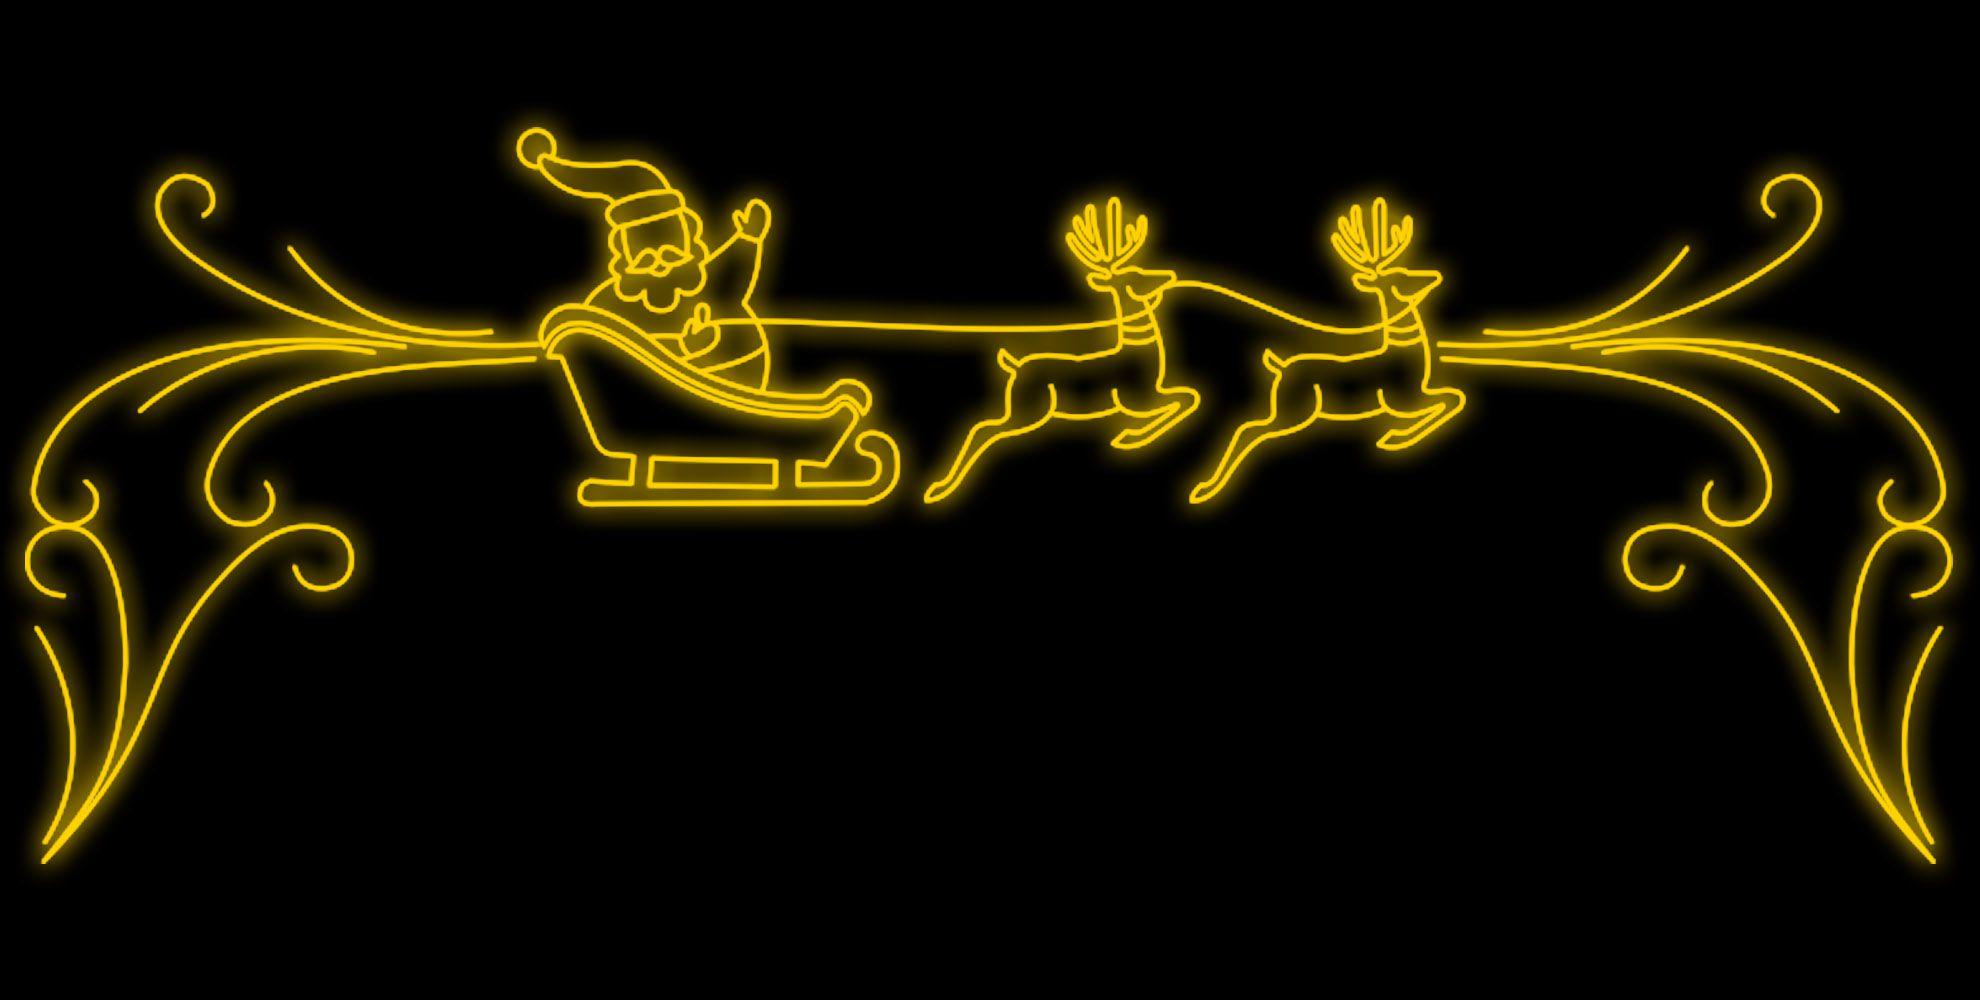 PO-009 - Painel Iluminado Led Papai Noel no Trenó - (Veja Opções Tamanhos)